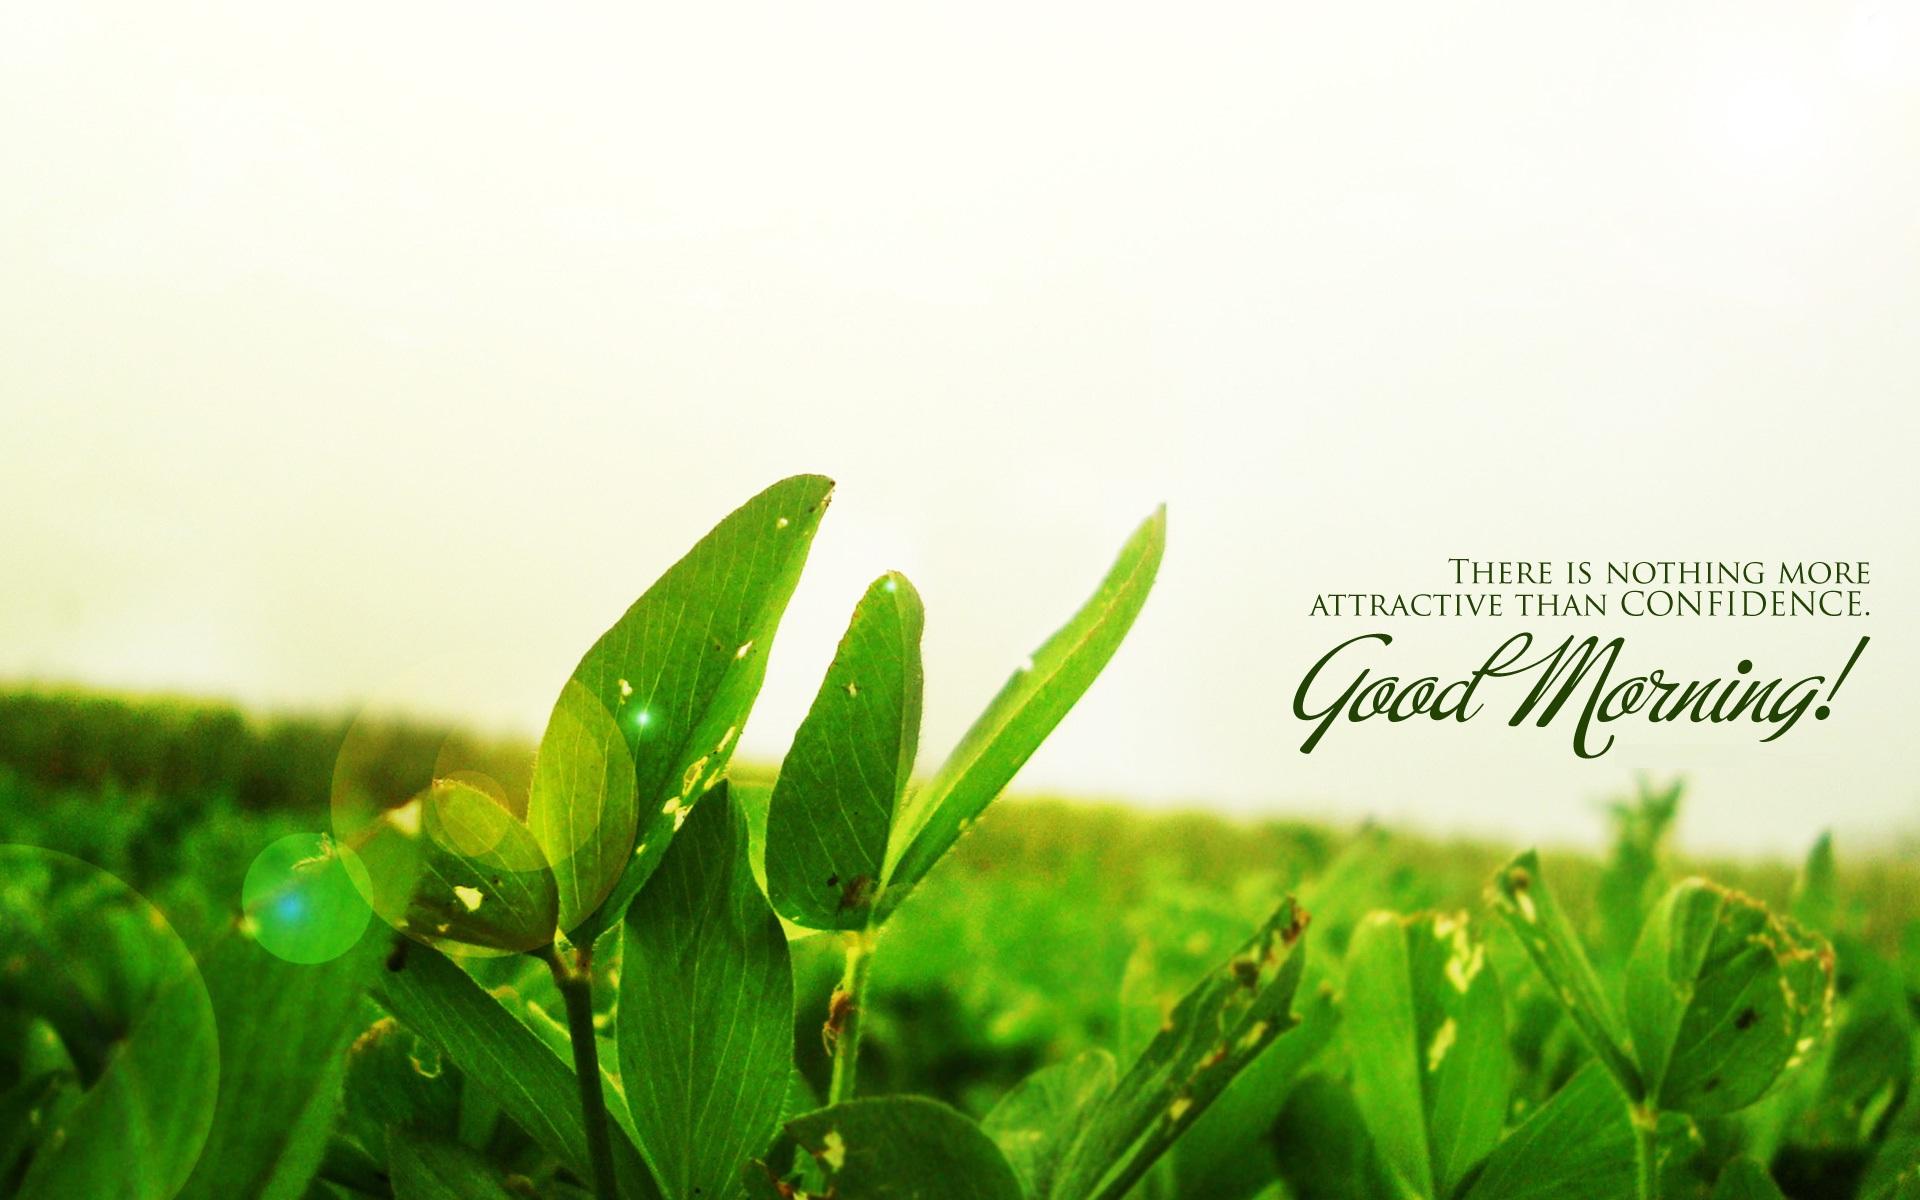 Good Morning Quotes Hd Wallpaper - Inspirational Good Morning Nature Quotes - HD Wallpaper